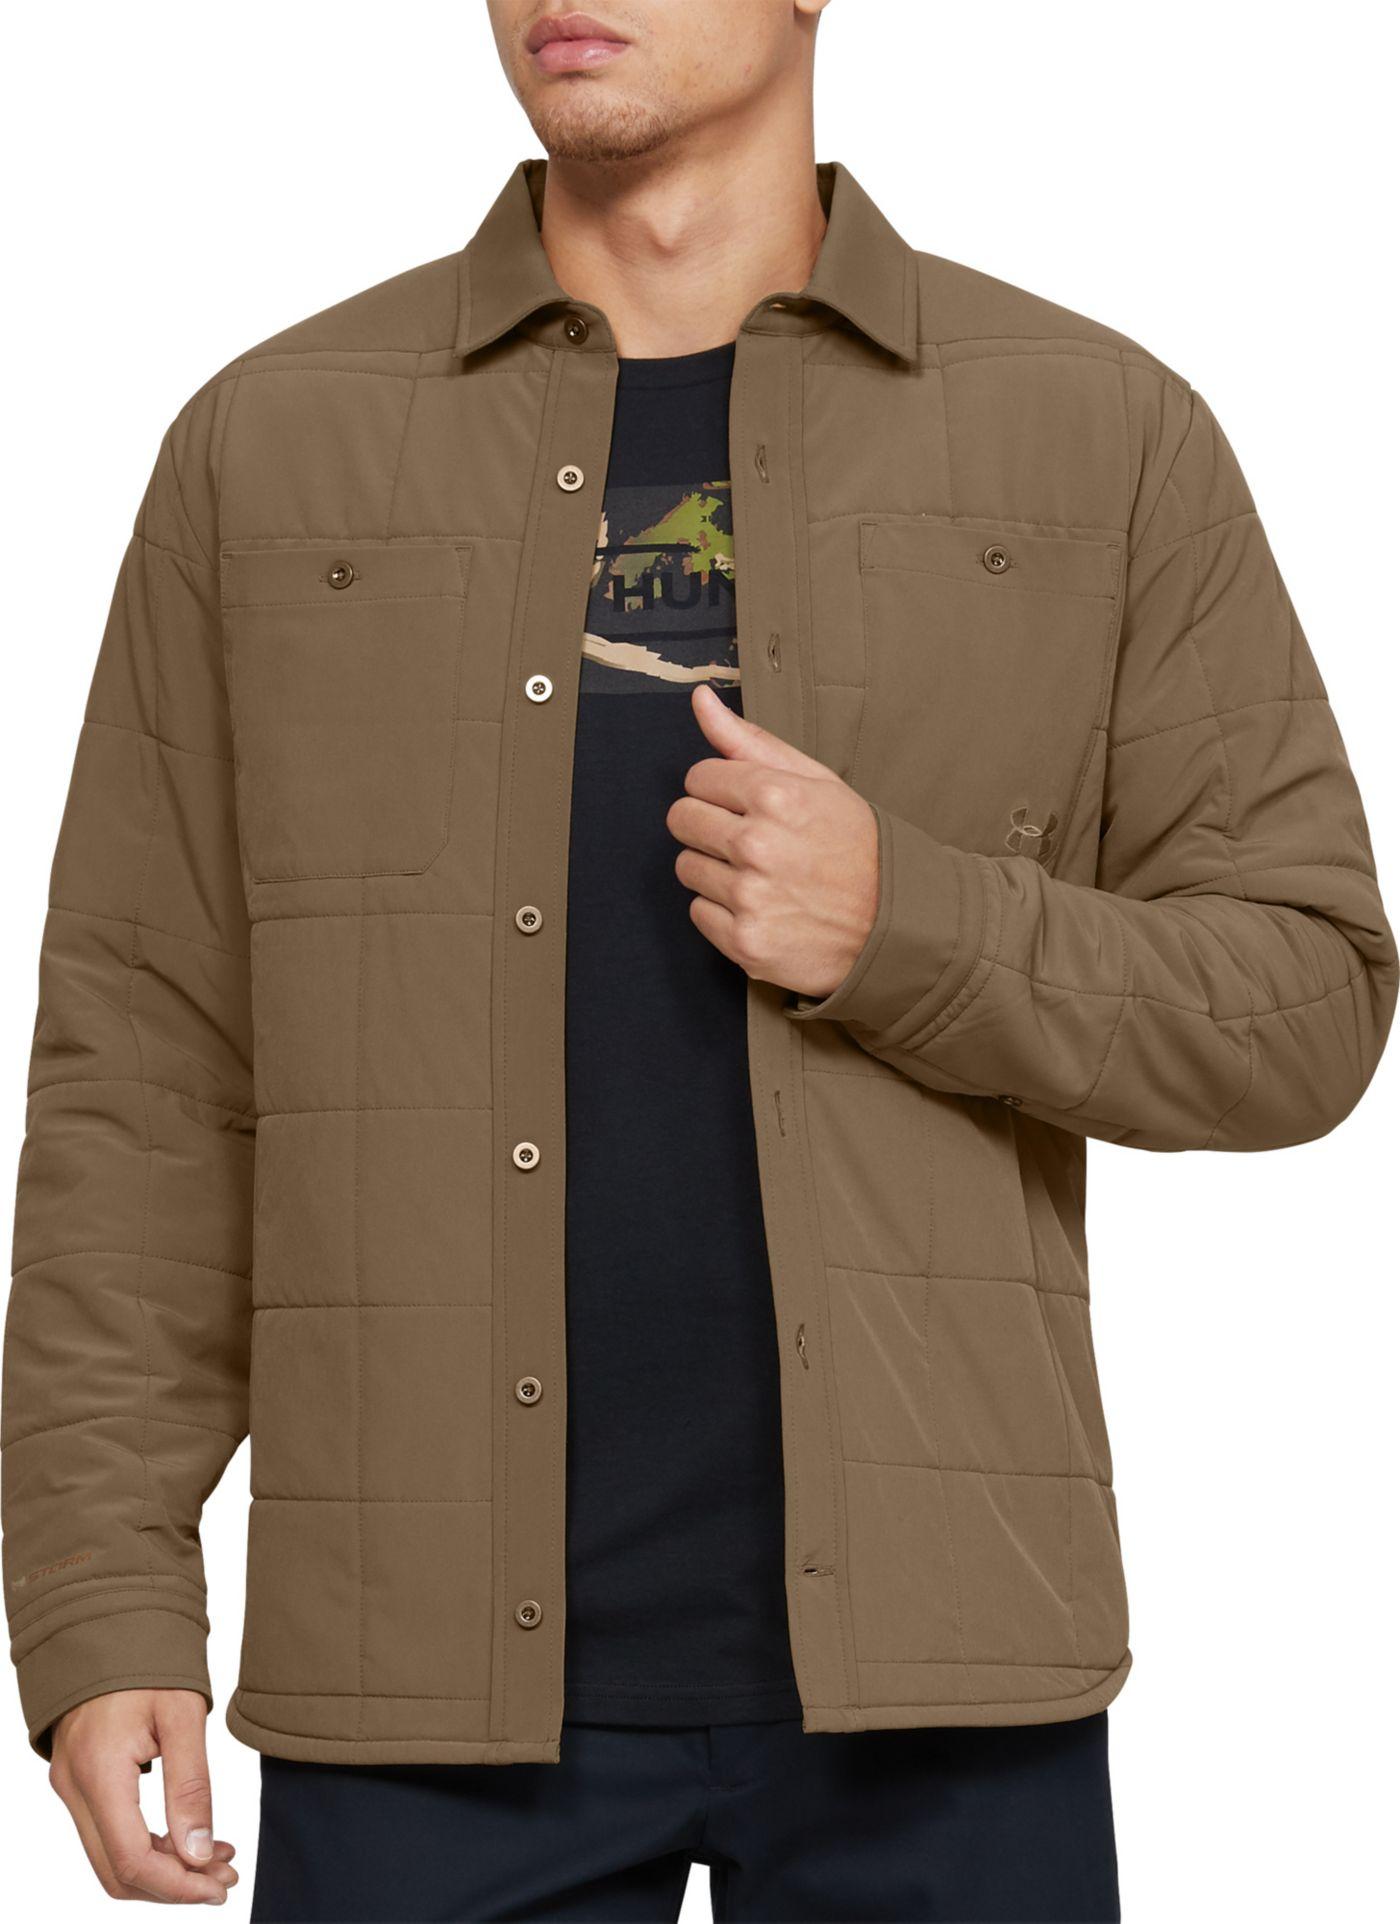 Under Armour Men's CG Latitude Shacket Jacket